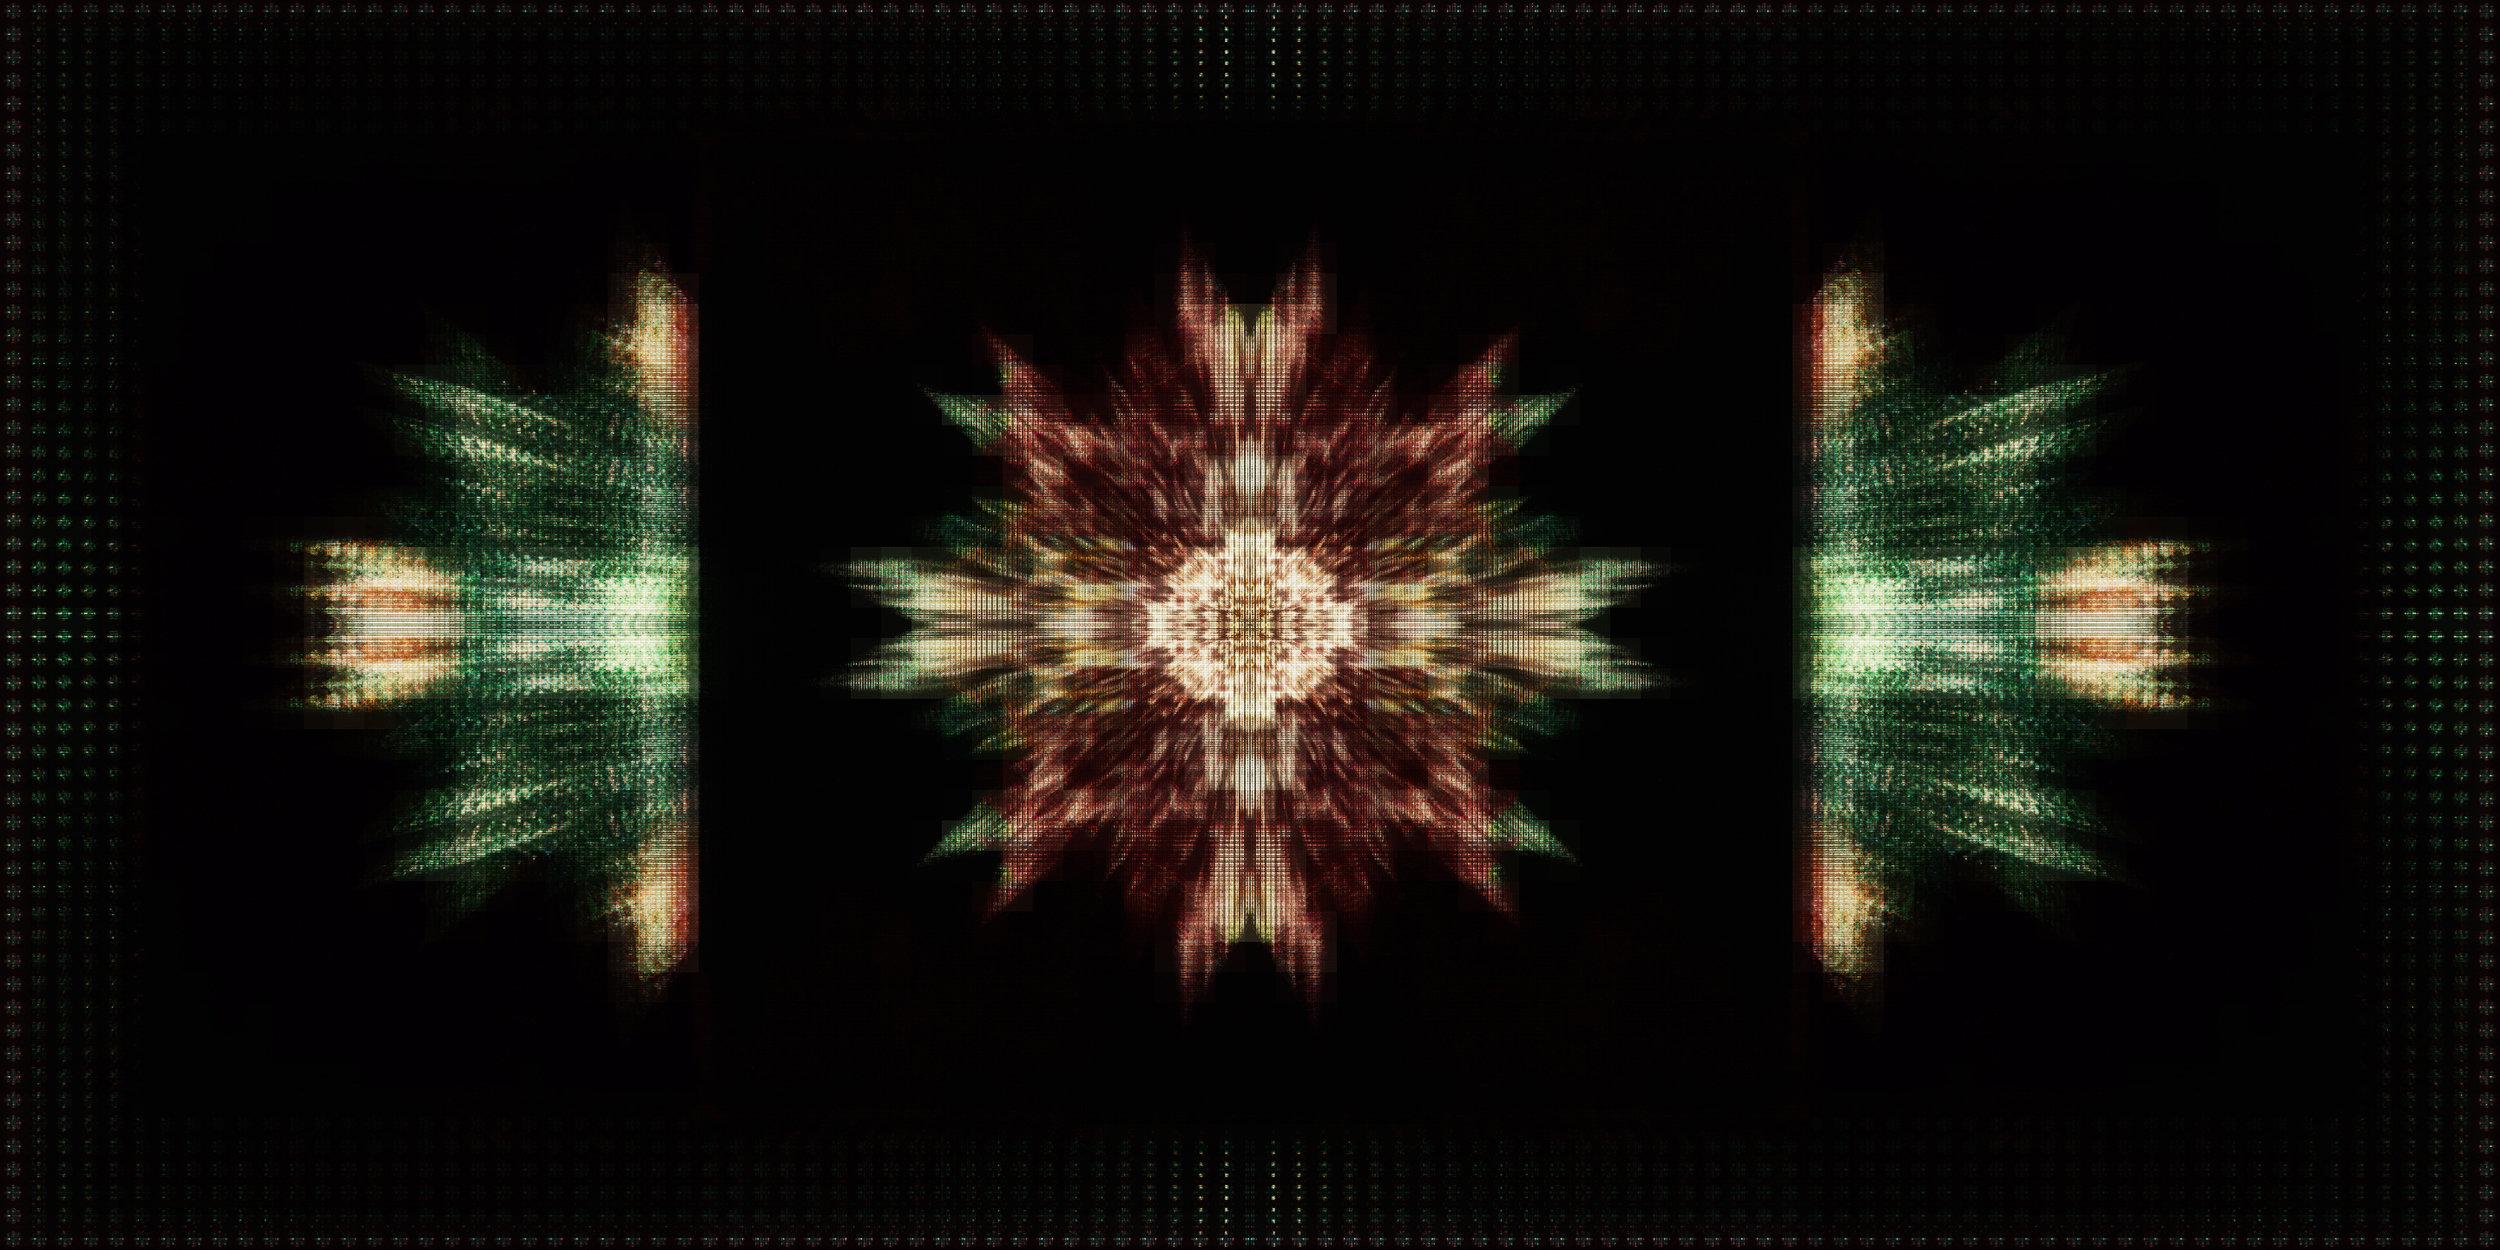 STAR 5  by PJM